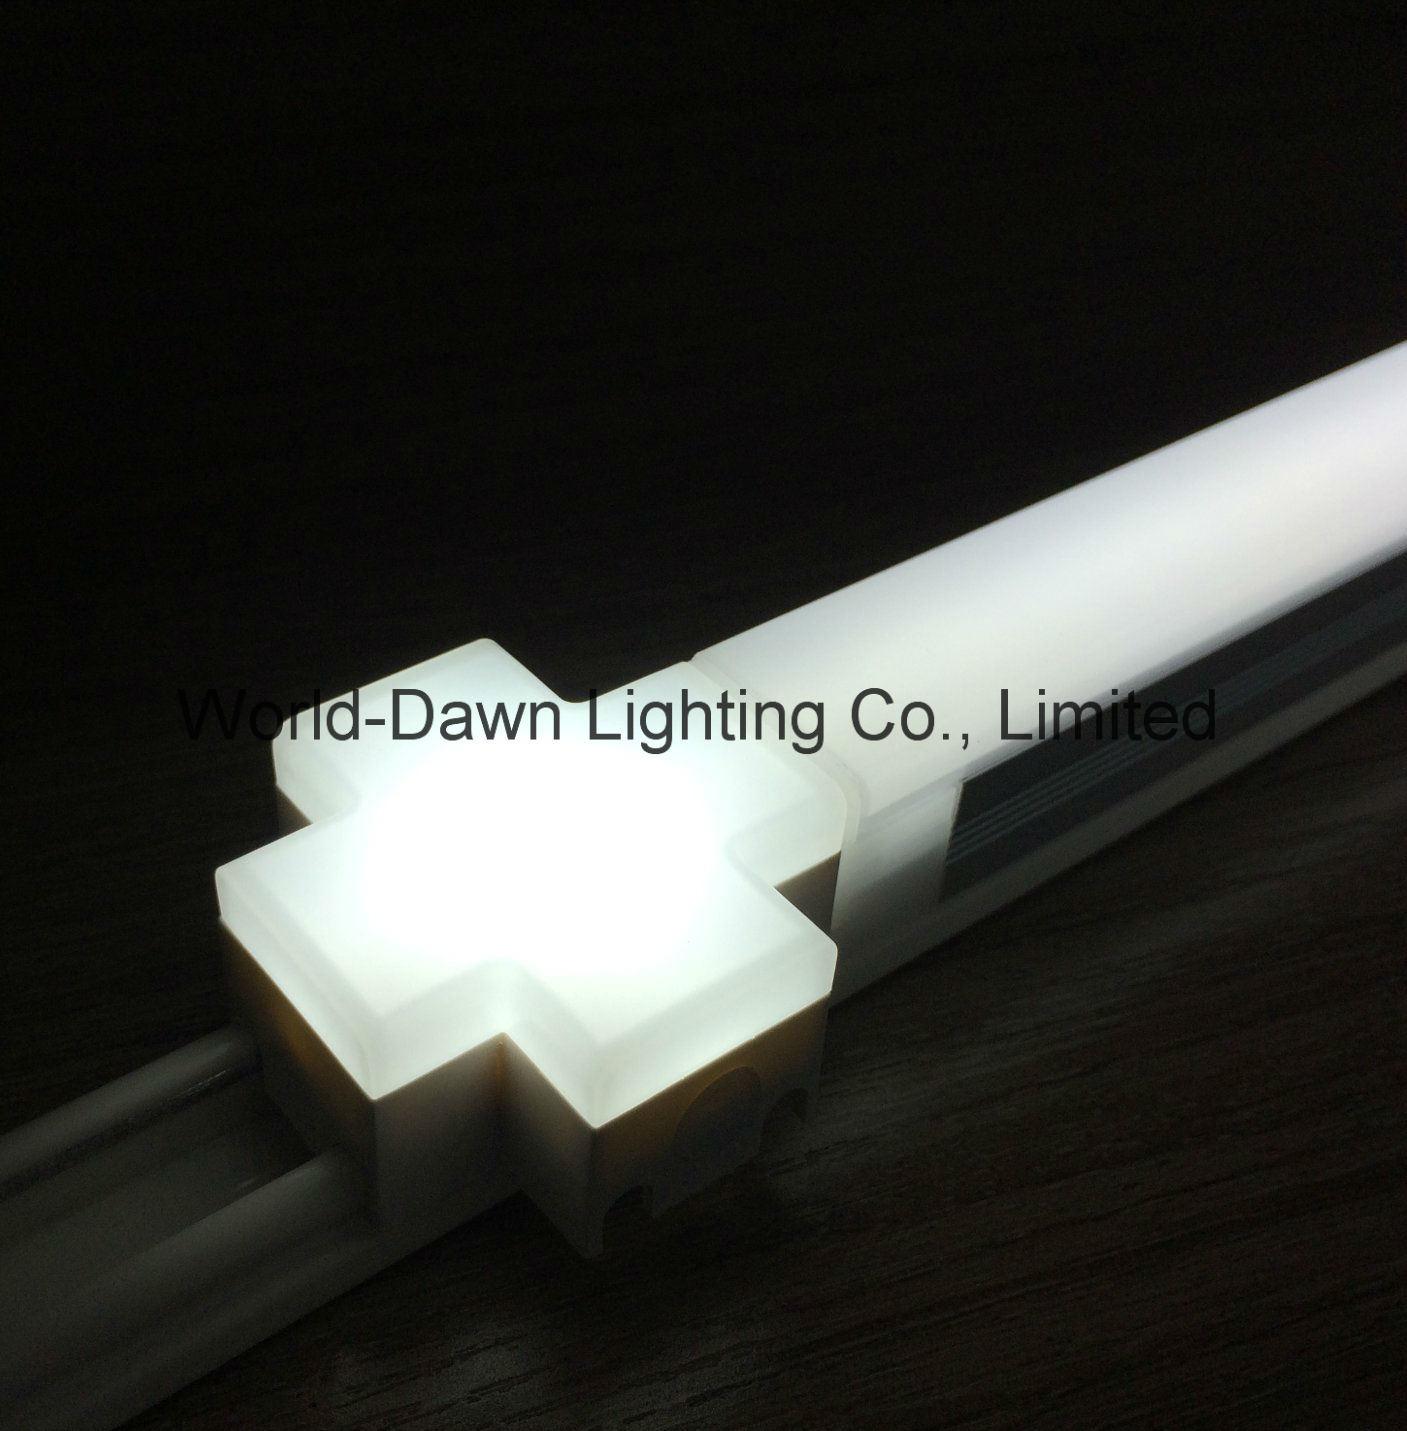 Hot Item Dc24v Led Rail Line Lamp Magnetic Type Wd Dga 3w 200